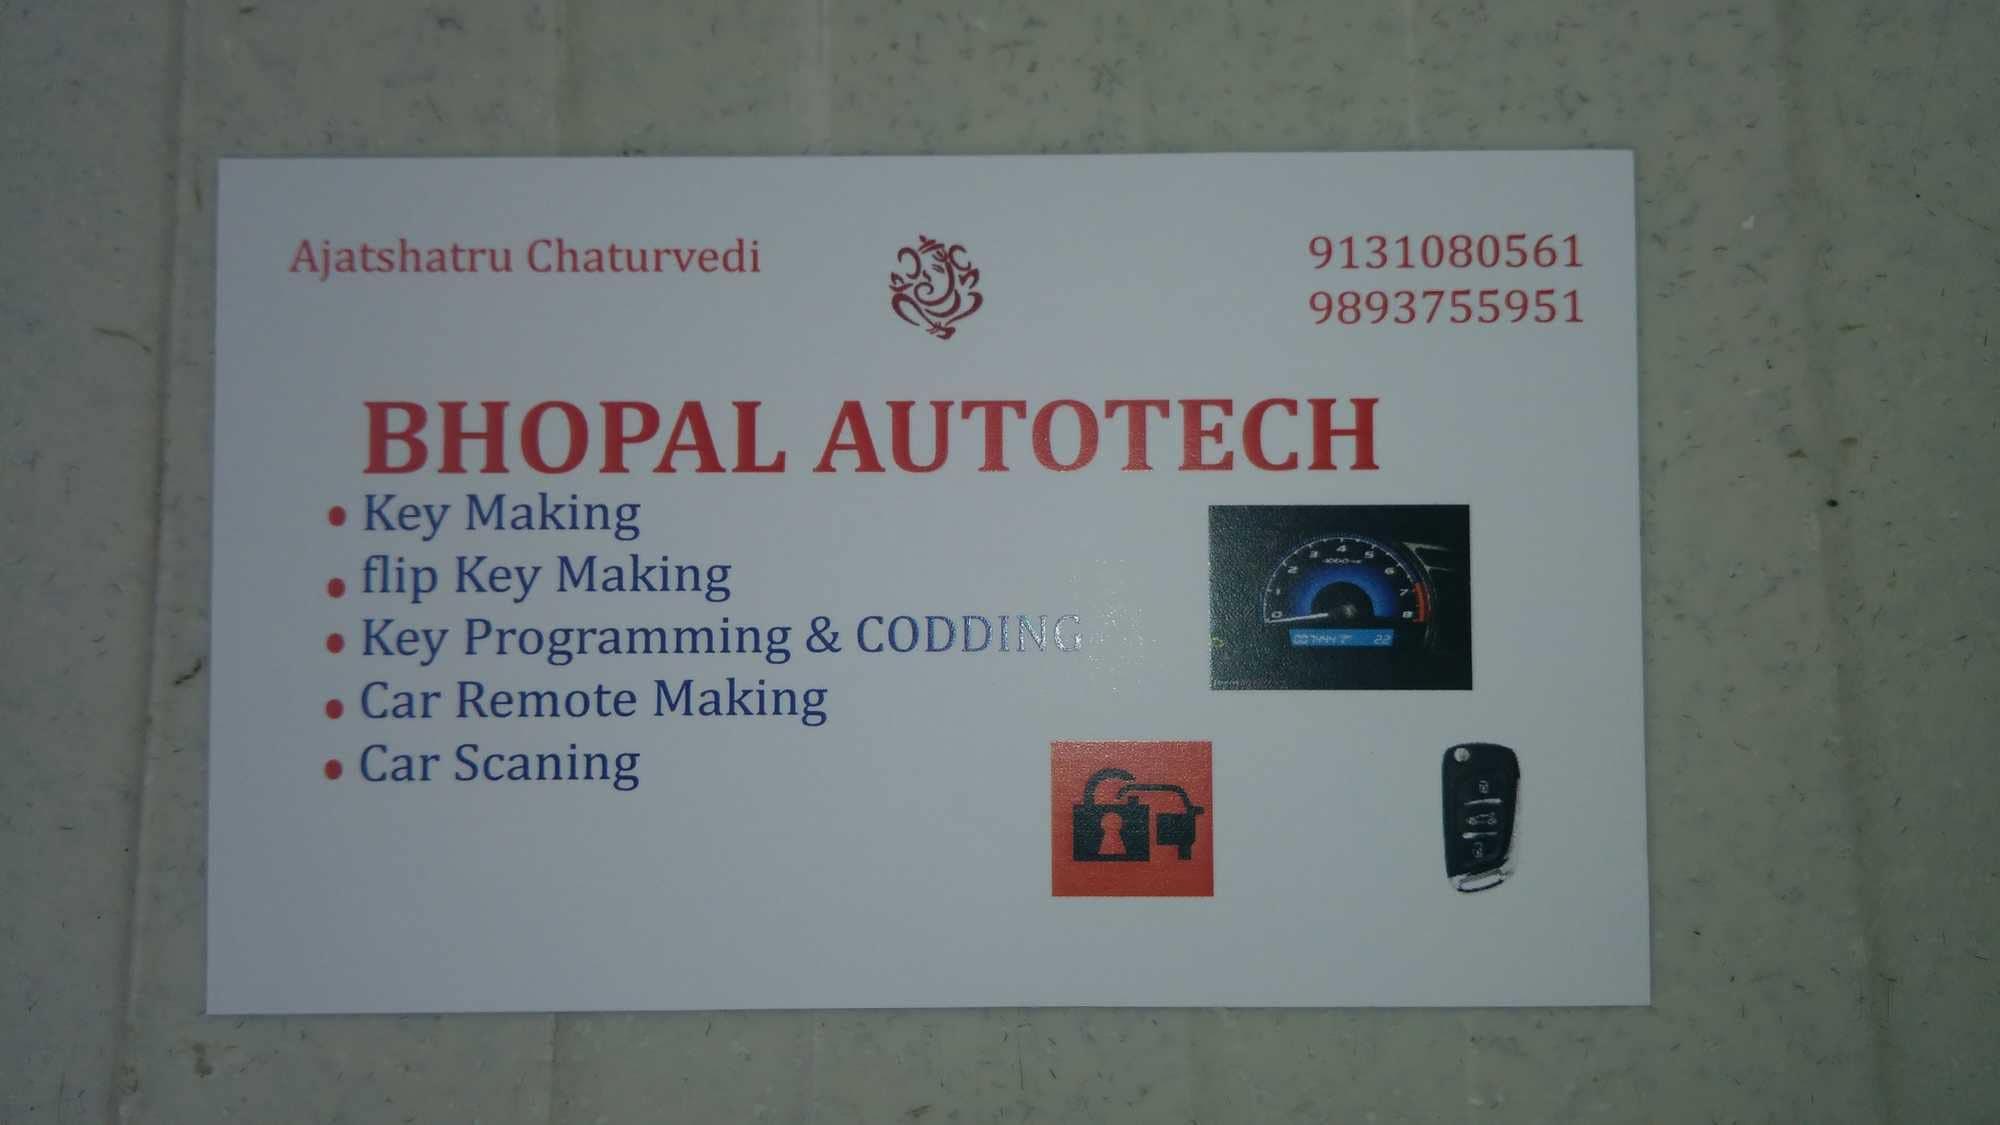 Top 20 Duplicate Key Makers in Bhopal - Best Key Makers